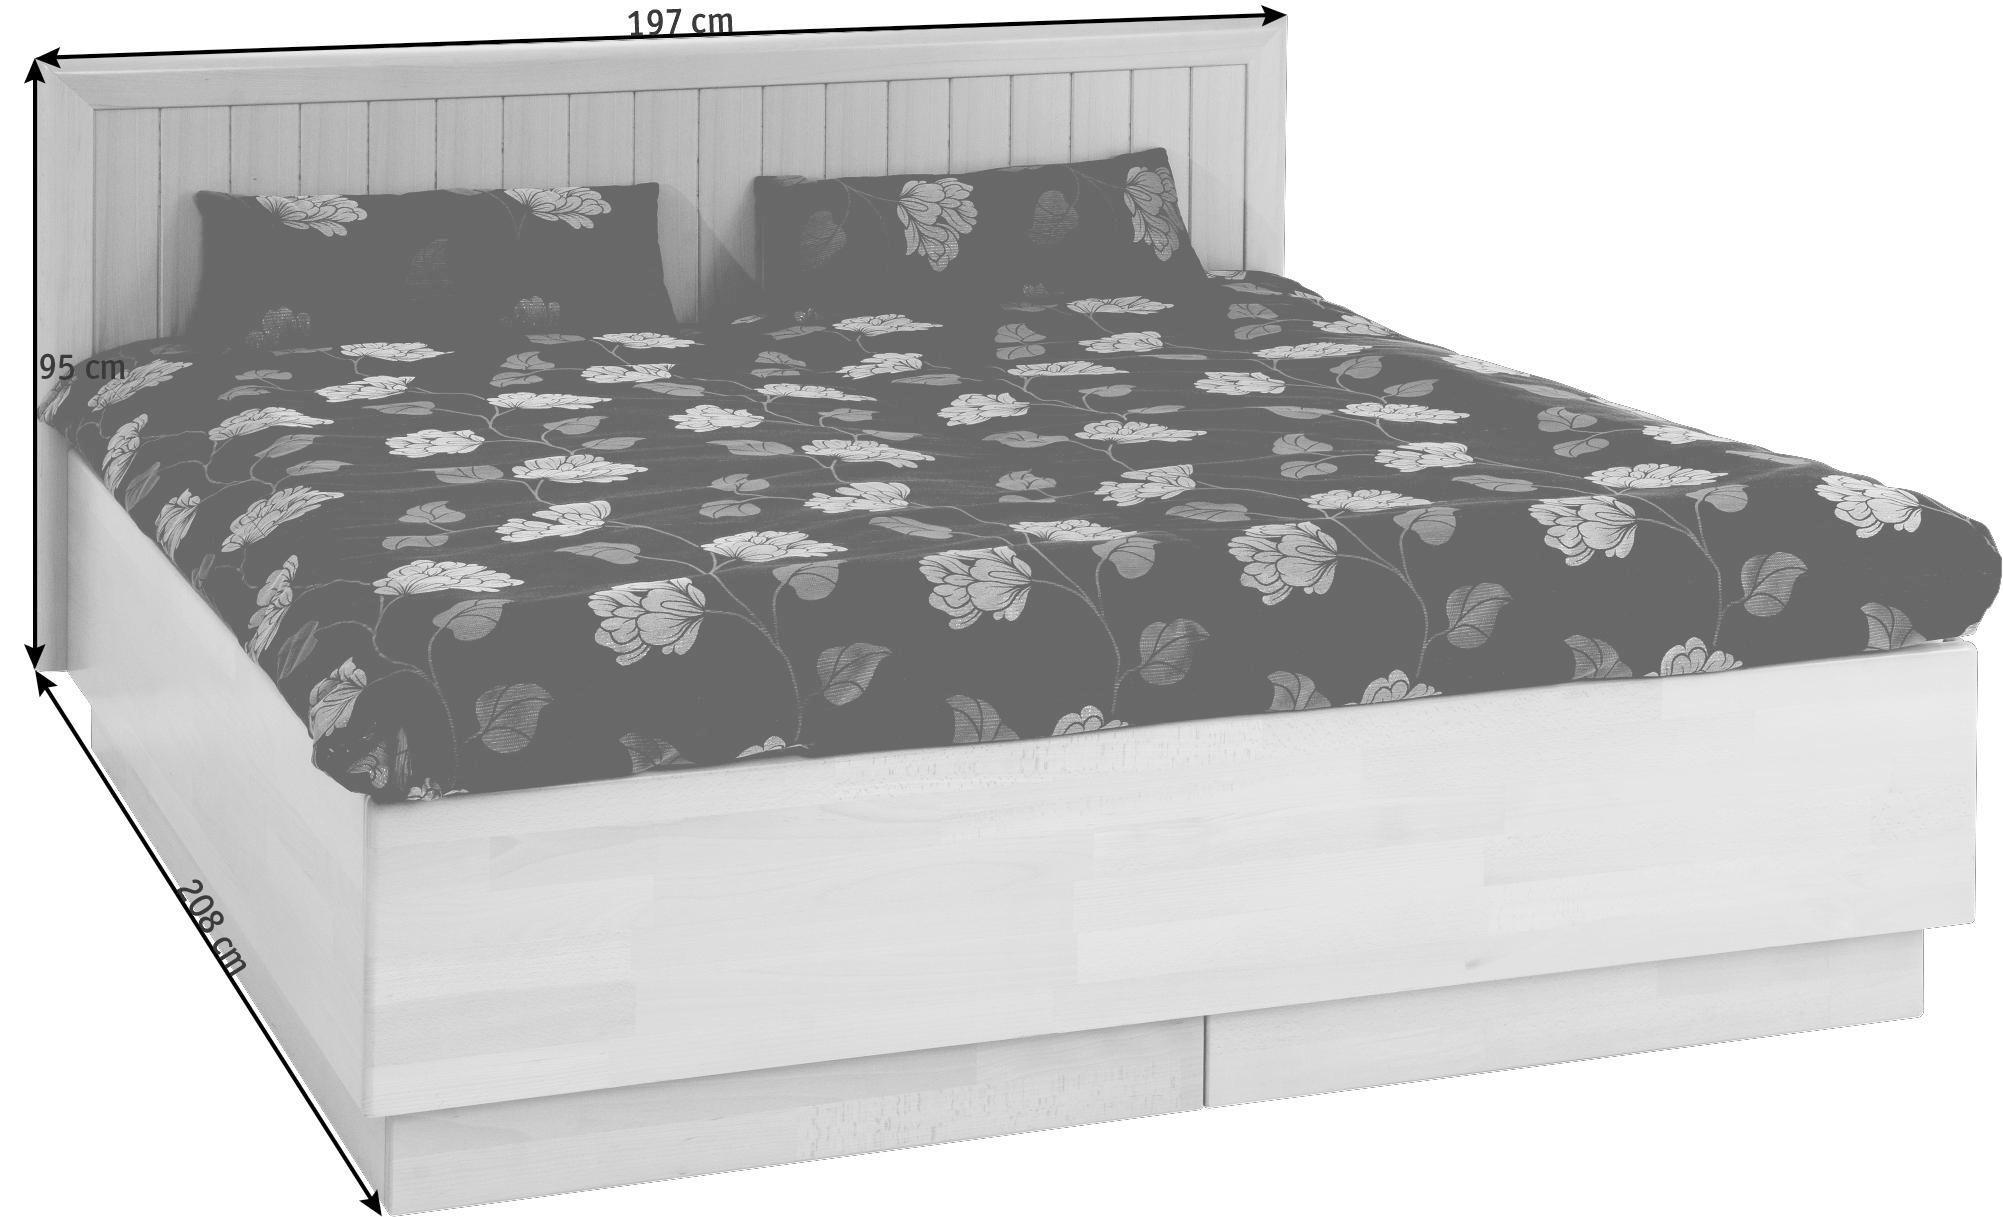 BETT 180 cm   x 200 cm   in Holz Buchefarben - Buchefarben, KONVENTIONELL, Holz (180/200cm) - NOVEL